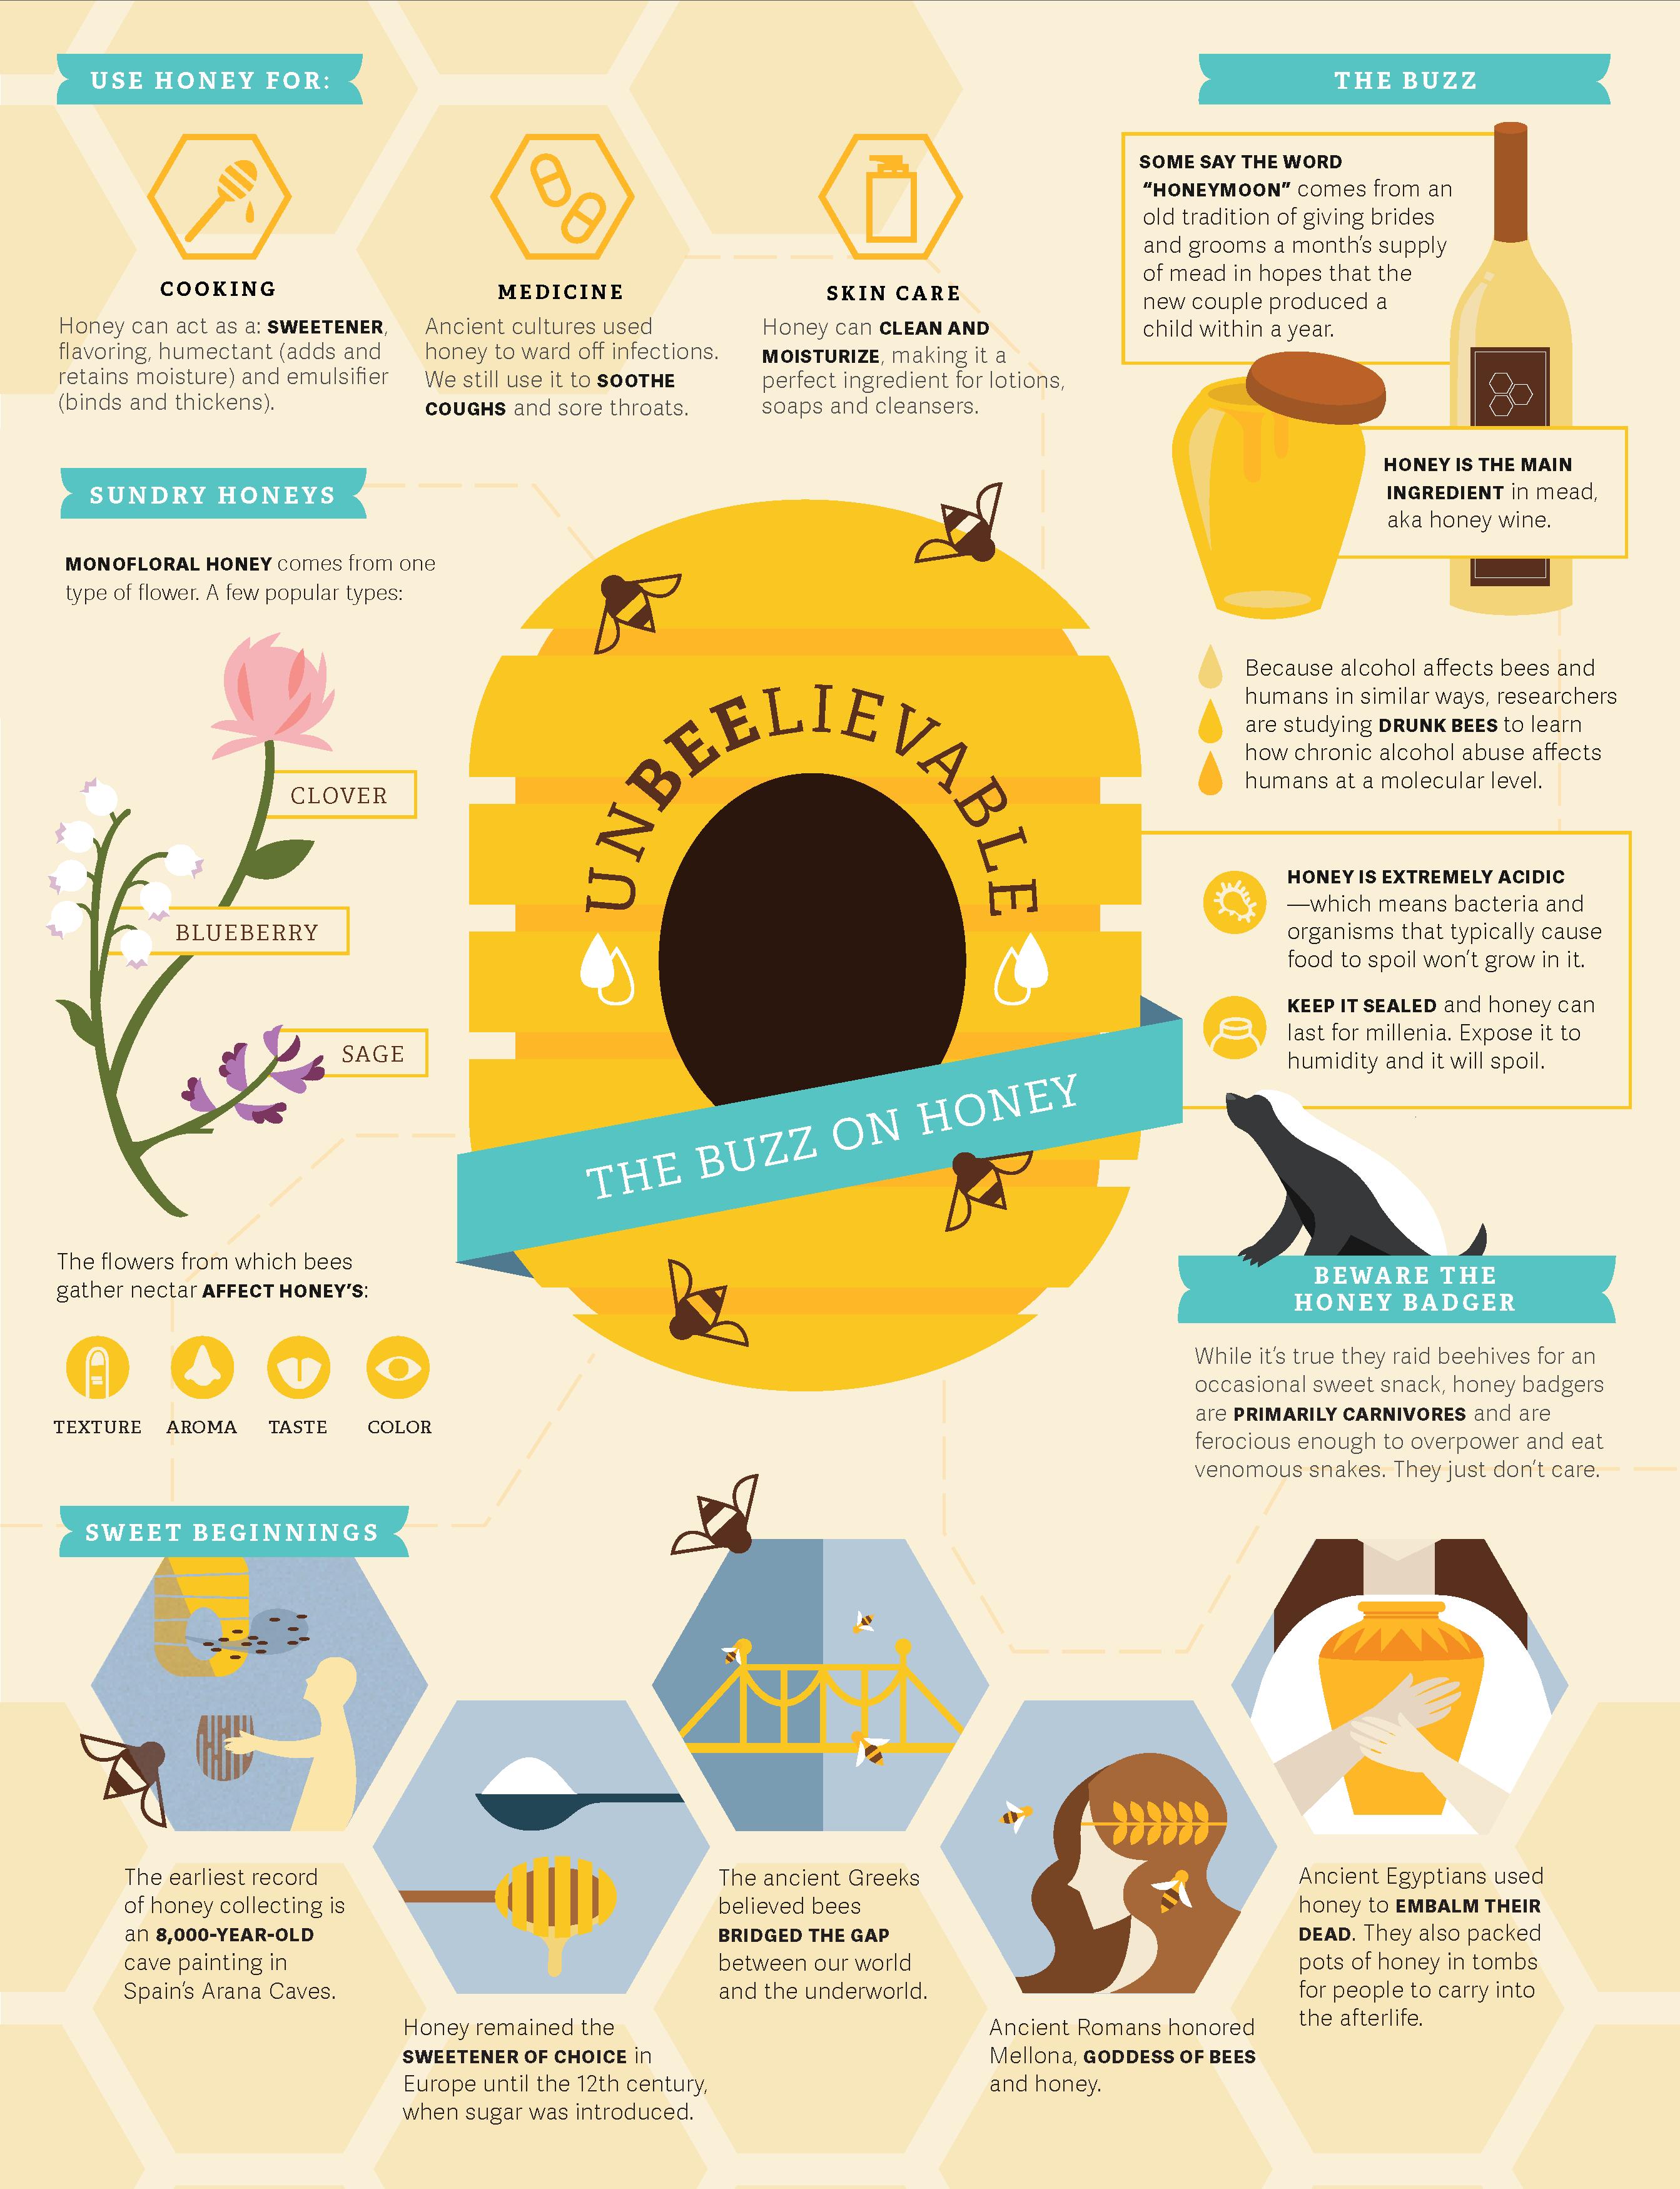 The Buzz on Honey